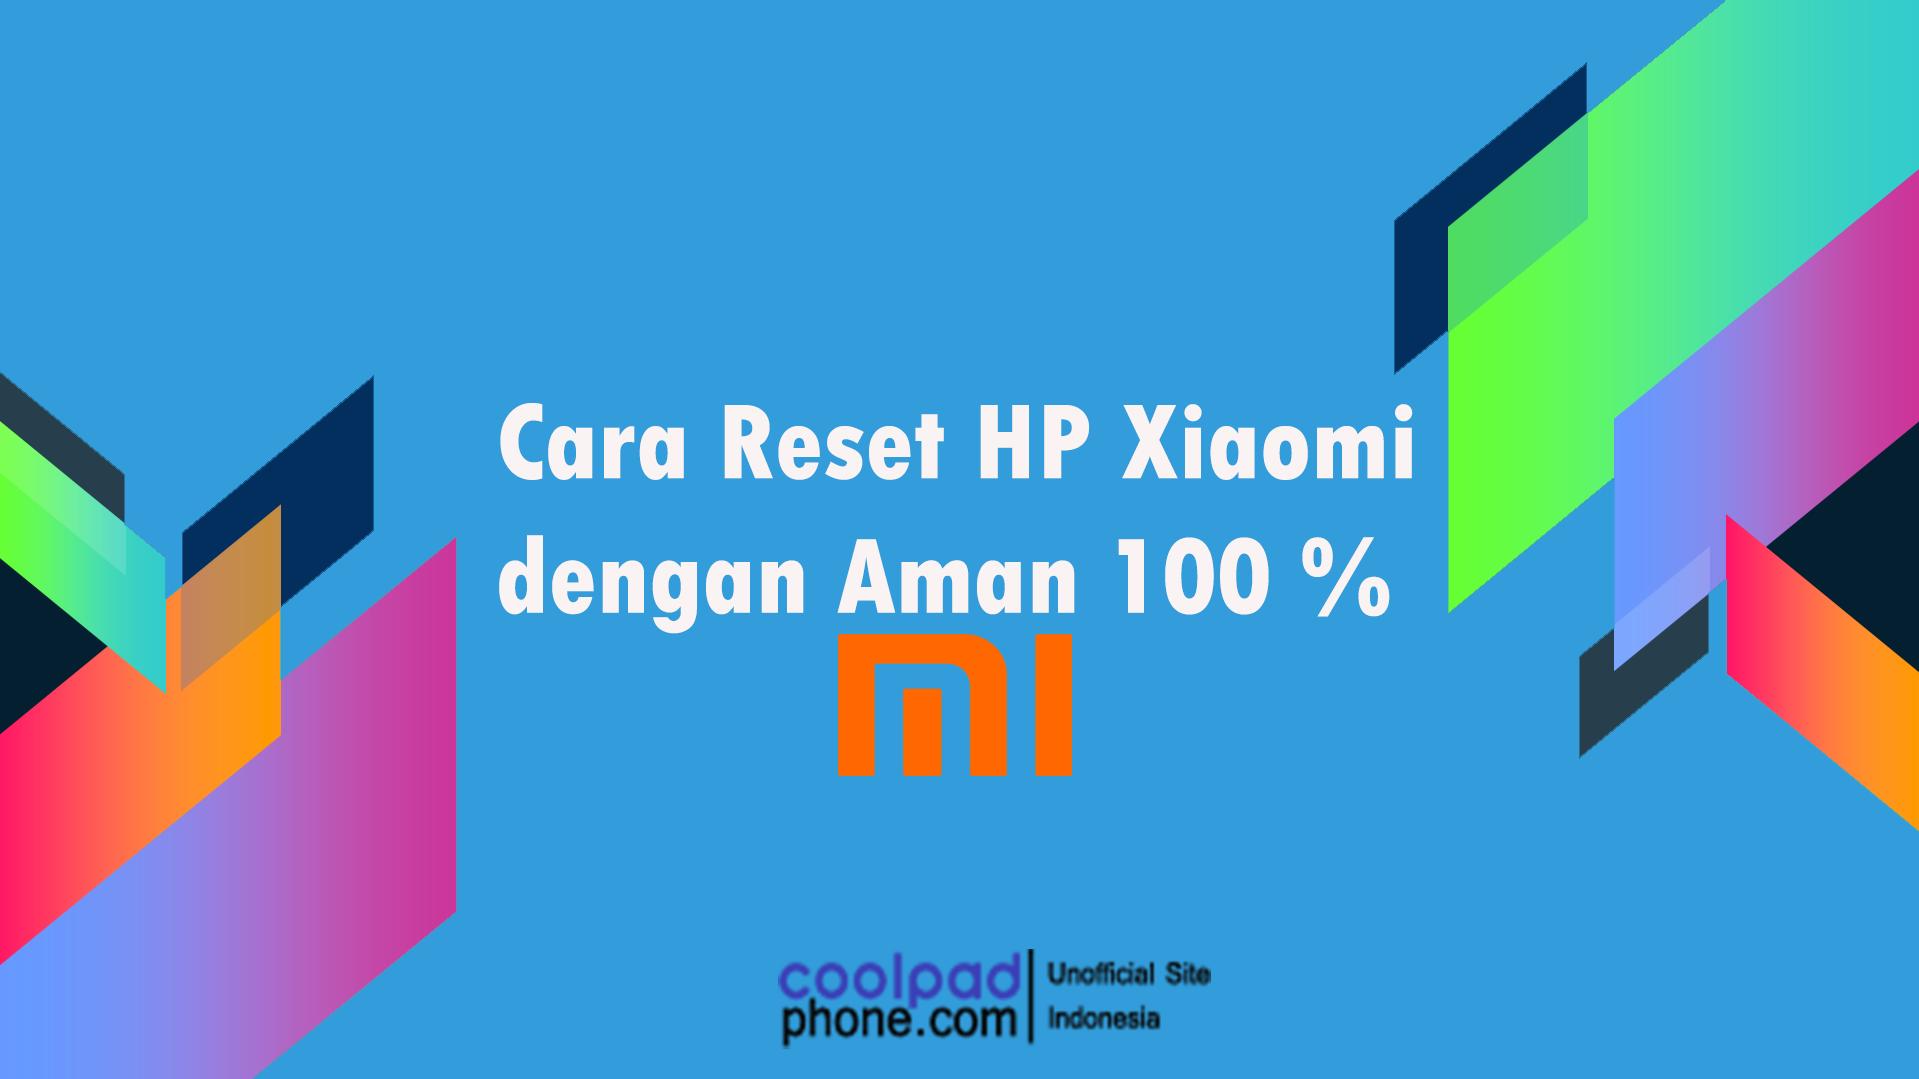 Cara Reset HP Xiaomi dengan Aman